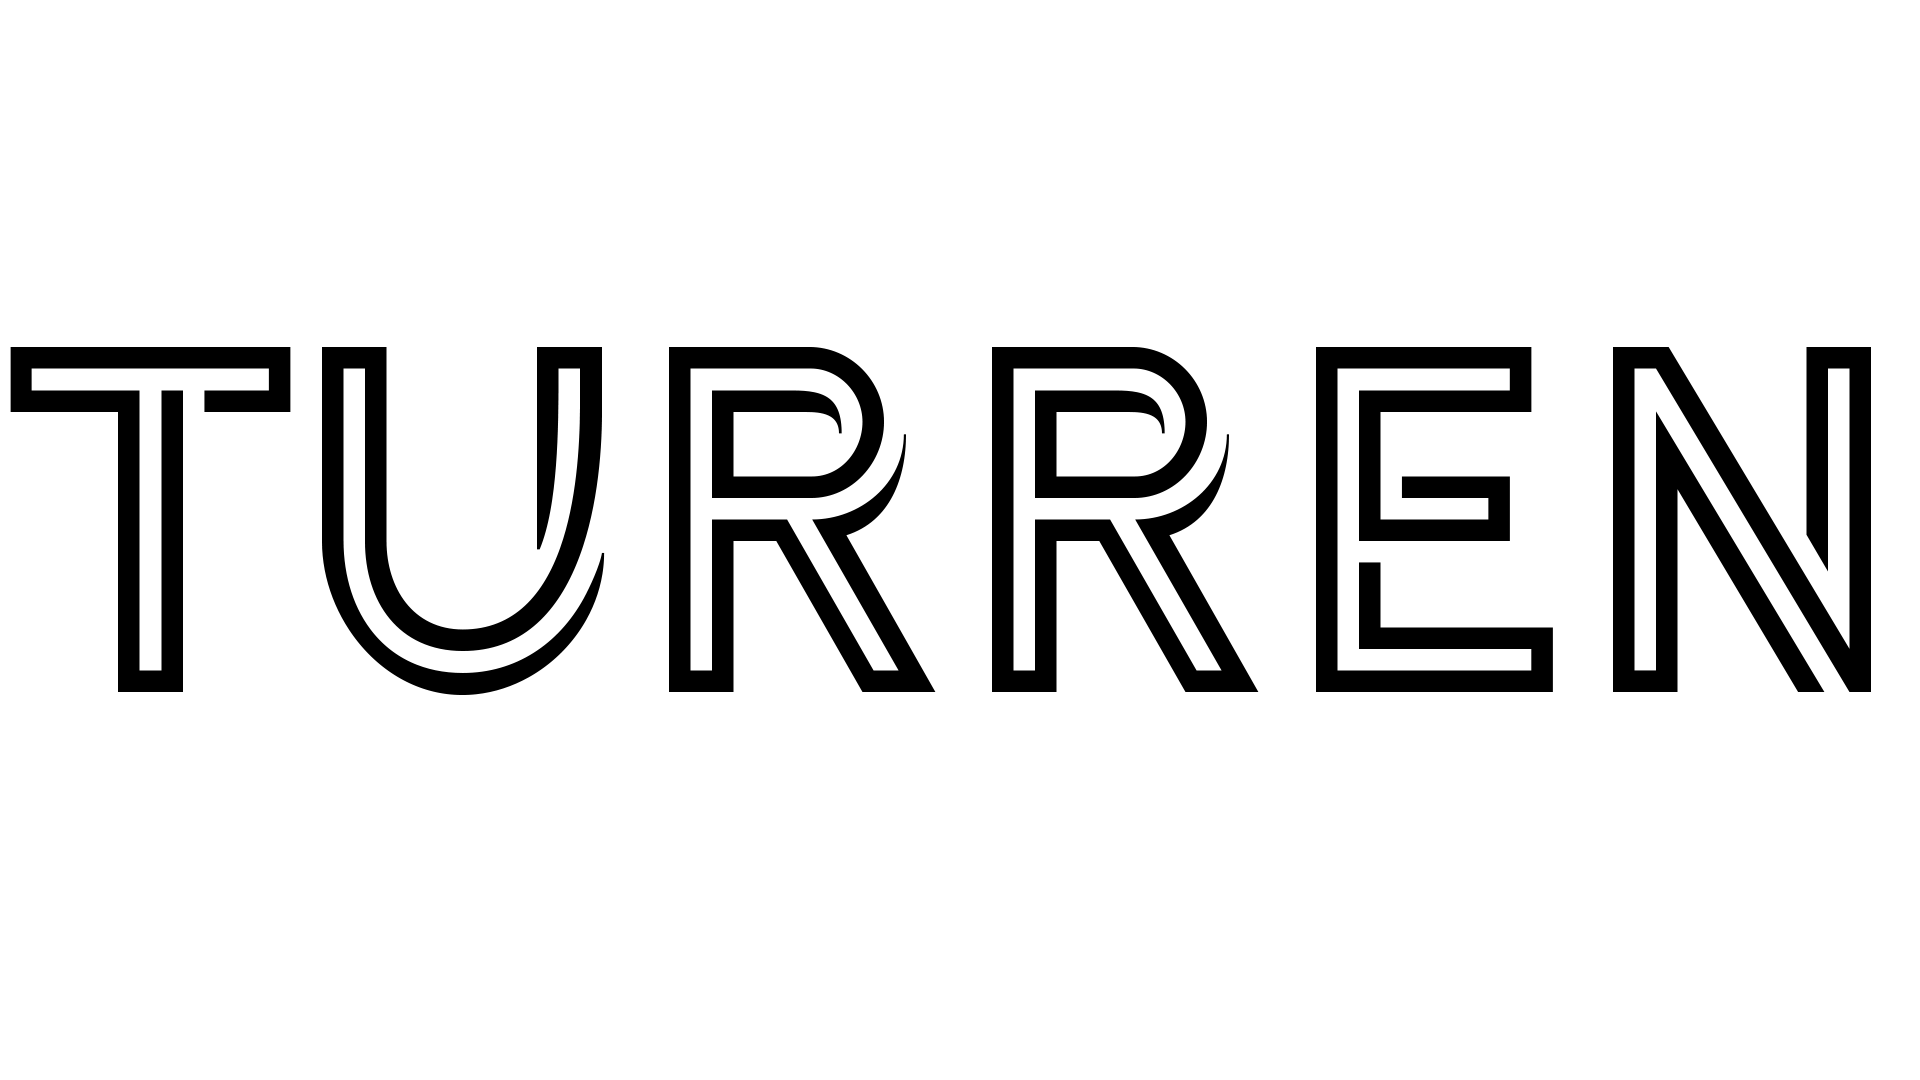 Black Turen transparent.png